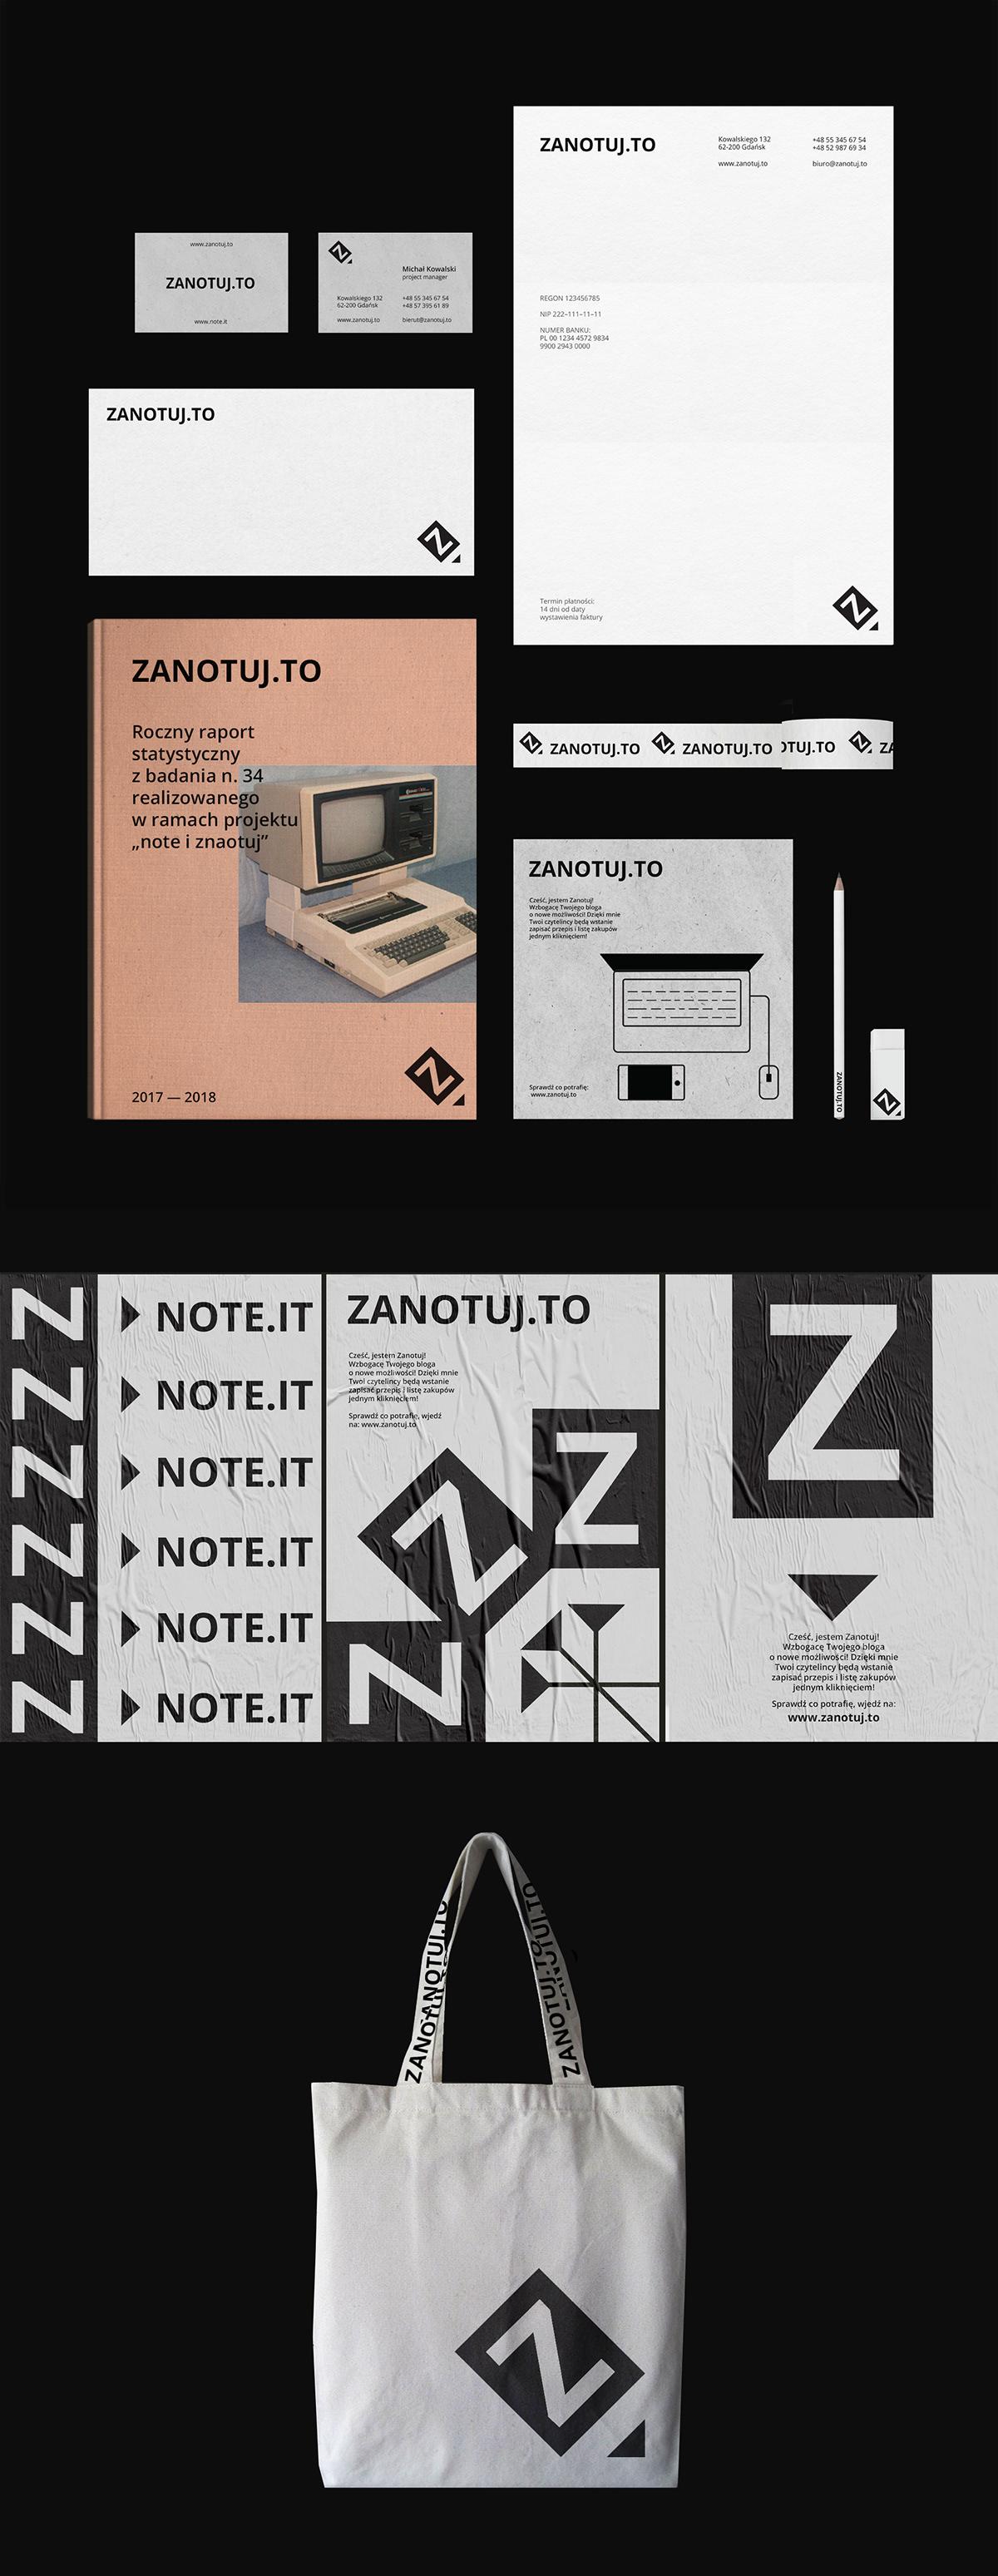 Zanotuj.to + Note.it = Bilingual logo design